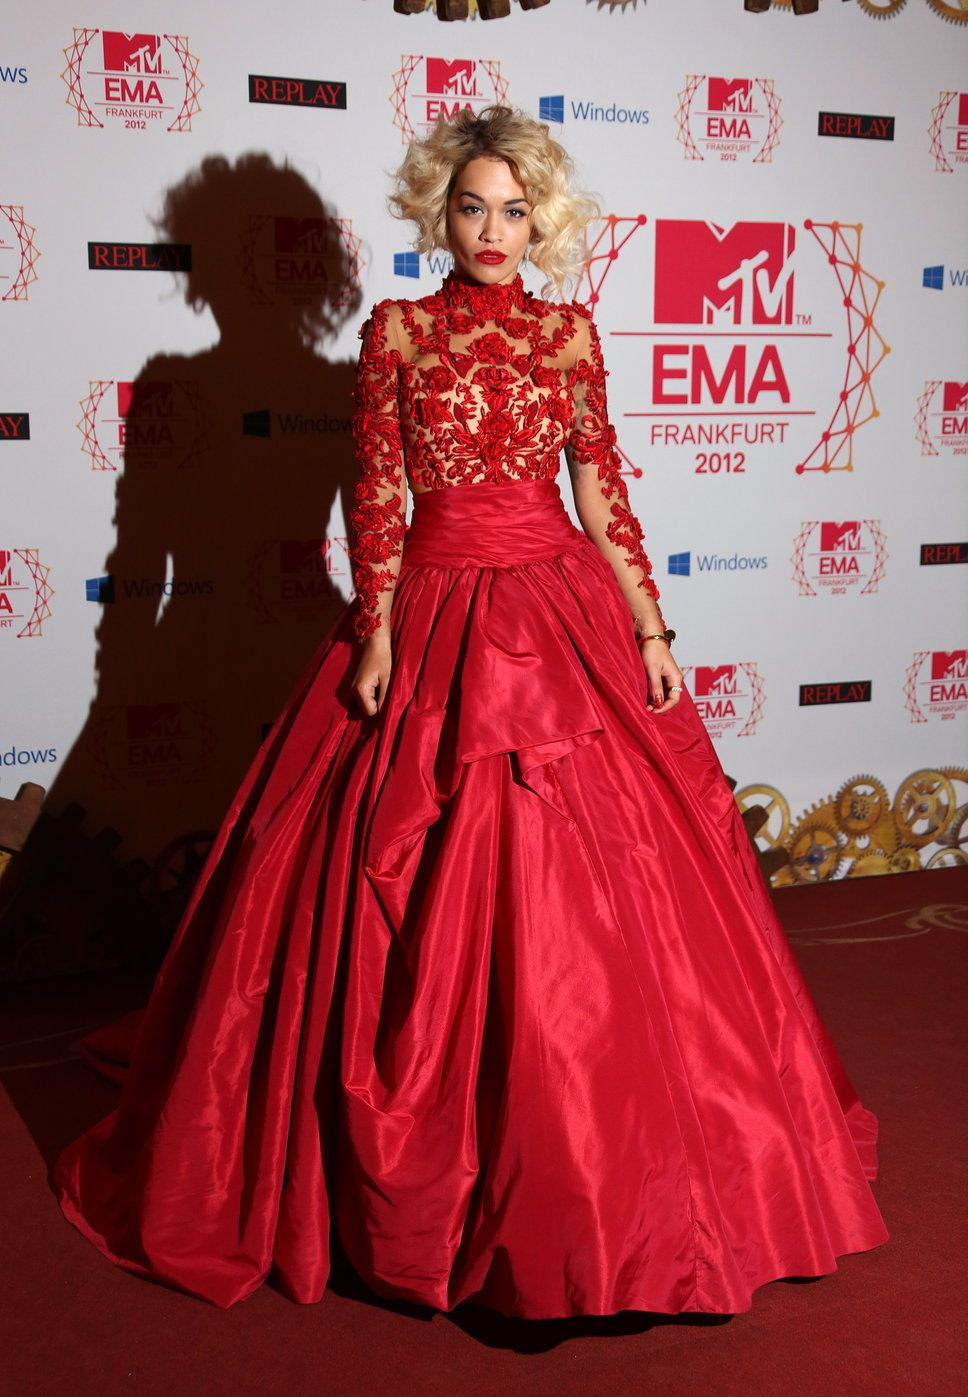 Rita Ora wearing red Marchesa dress by Georgina Chapman and Keren ...